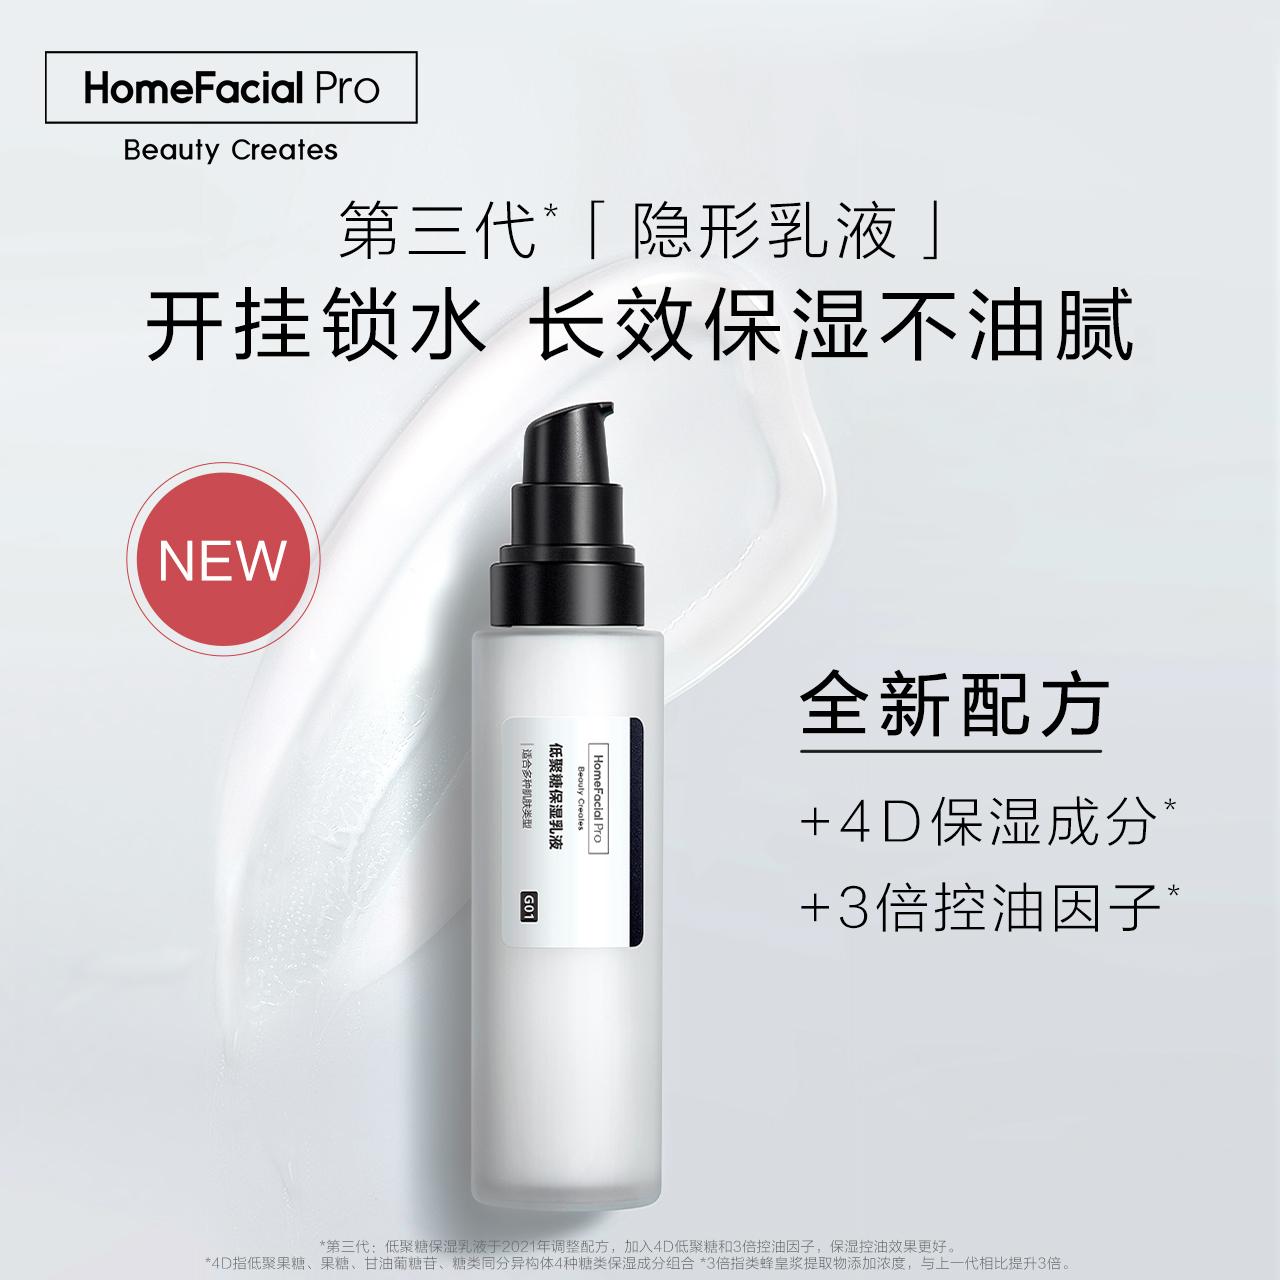 hfp低聚糖夏季清爽不油腻保湿乳液